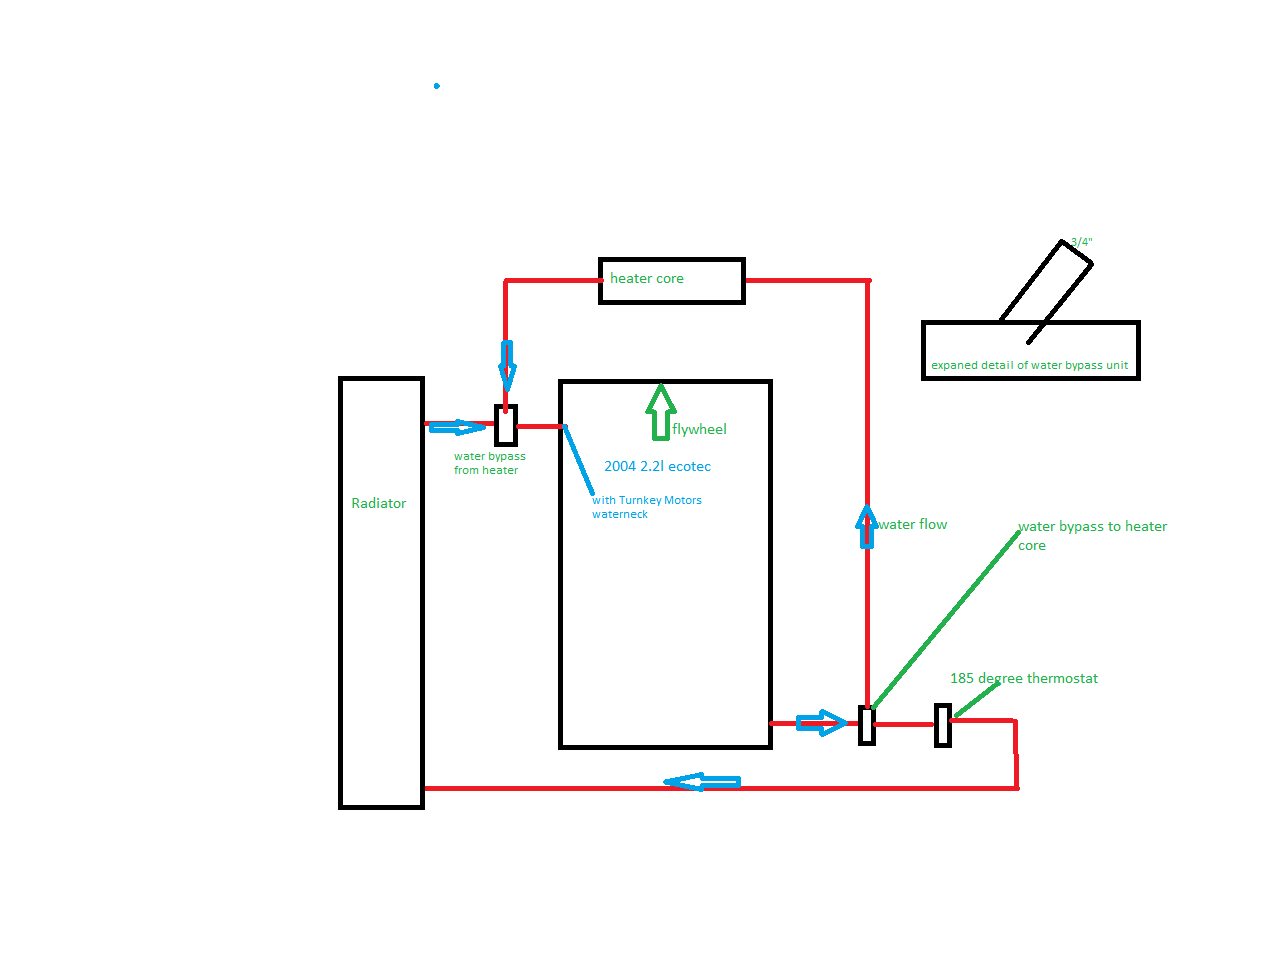 ecotec coolant plumbing race dezert ecotec water flow diagram png